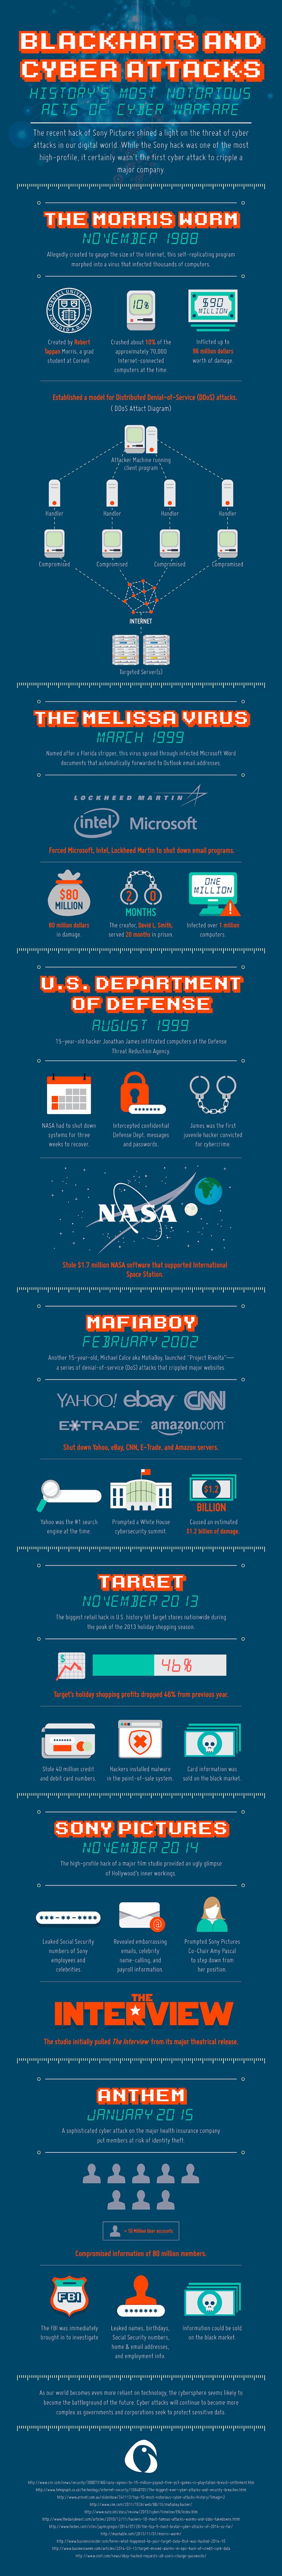 blackhats-cyber-attacks-infographic-corpinfo